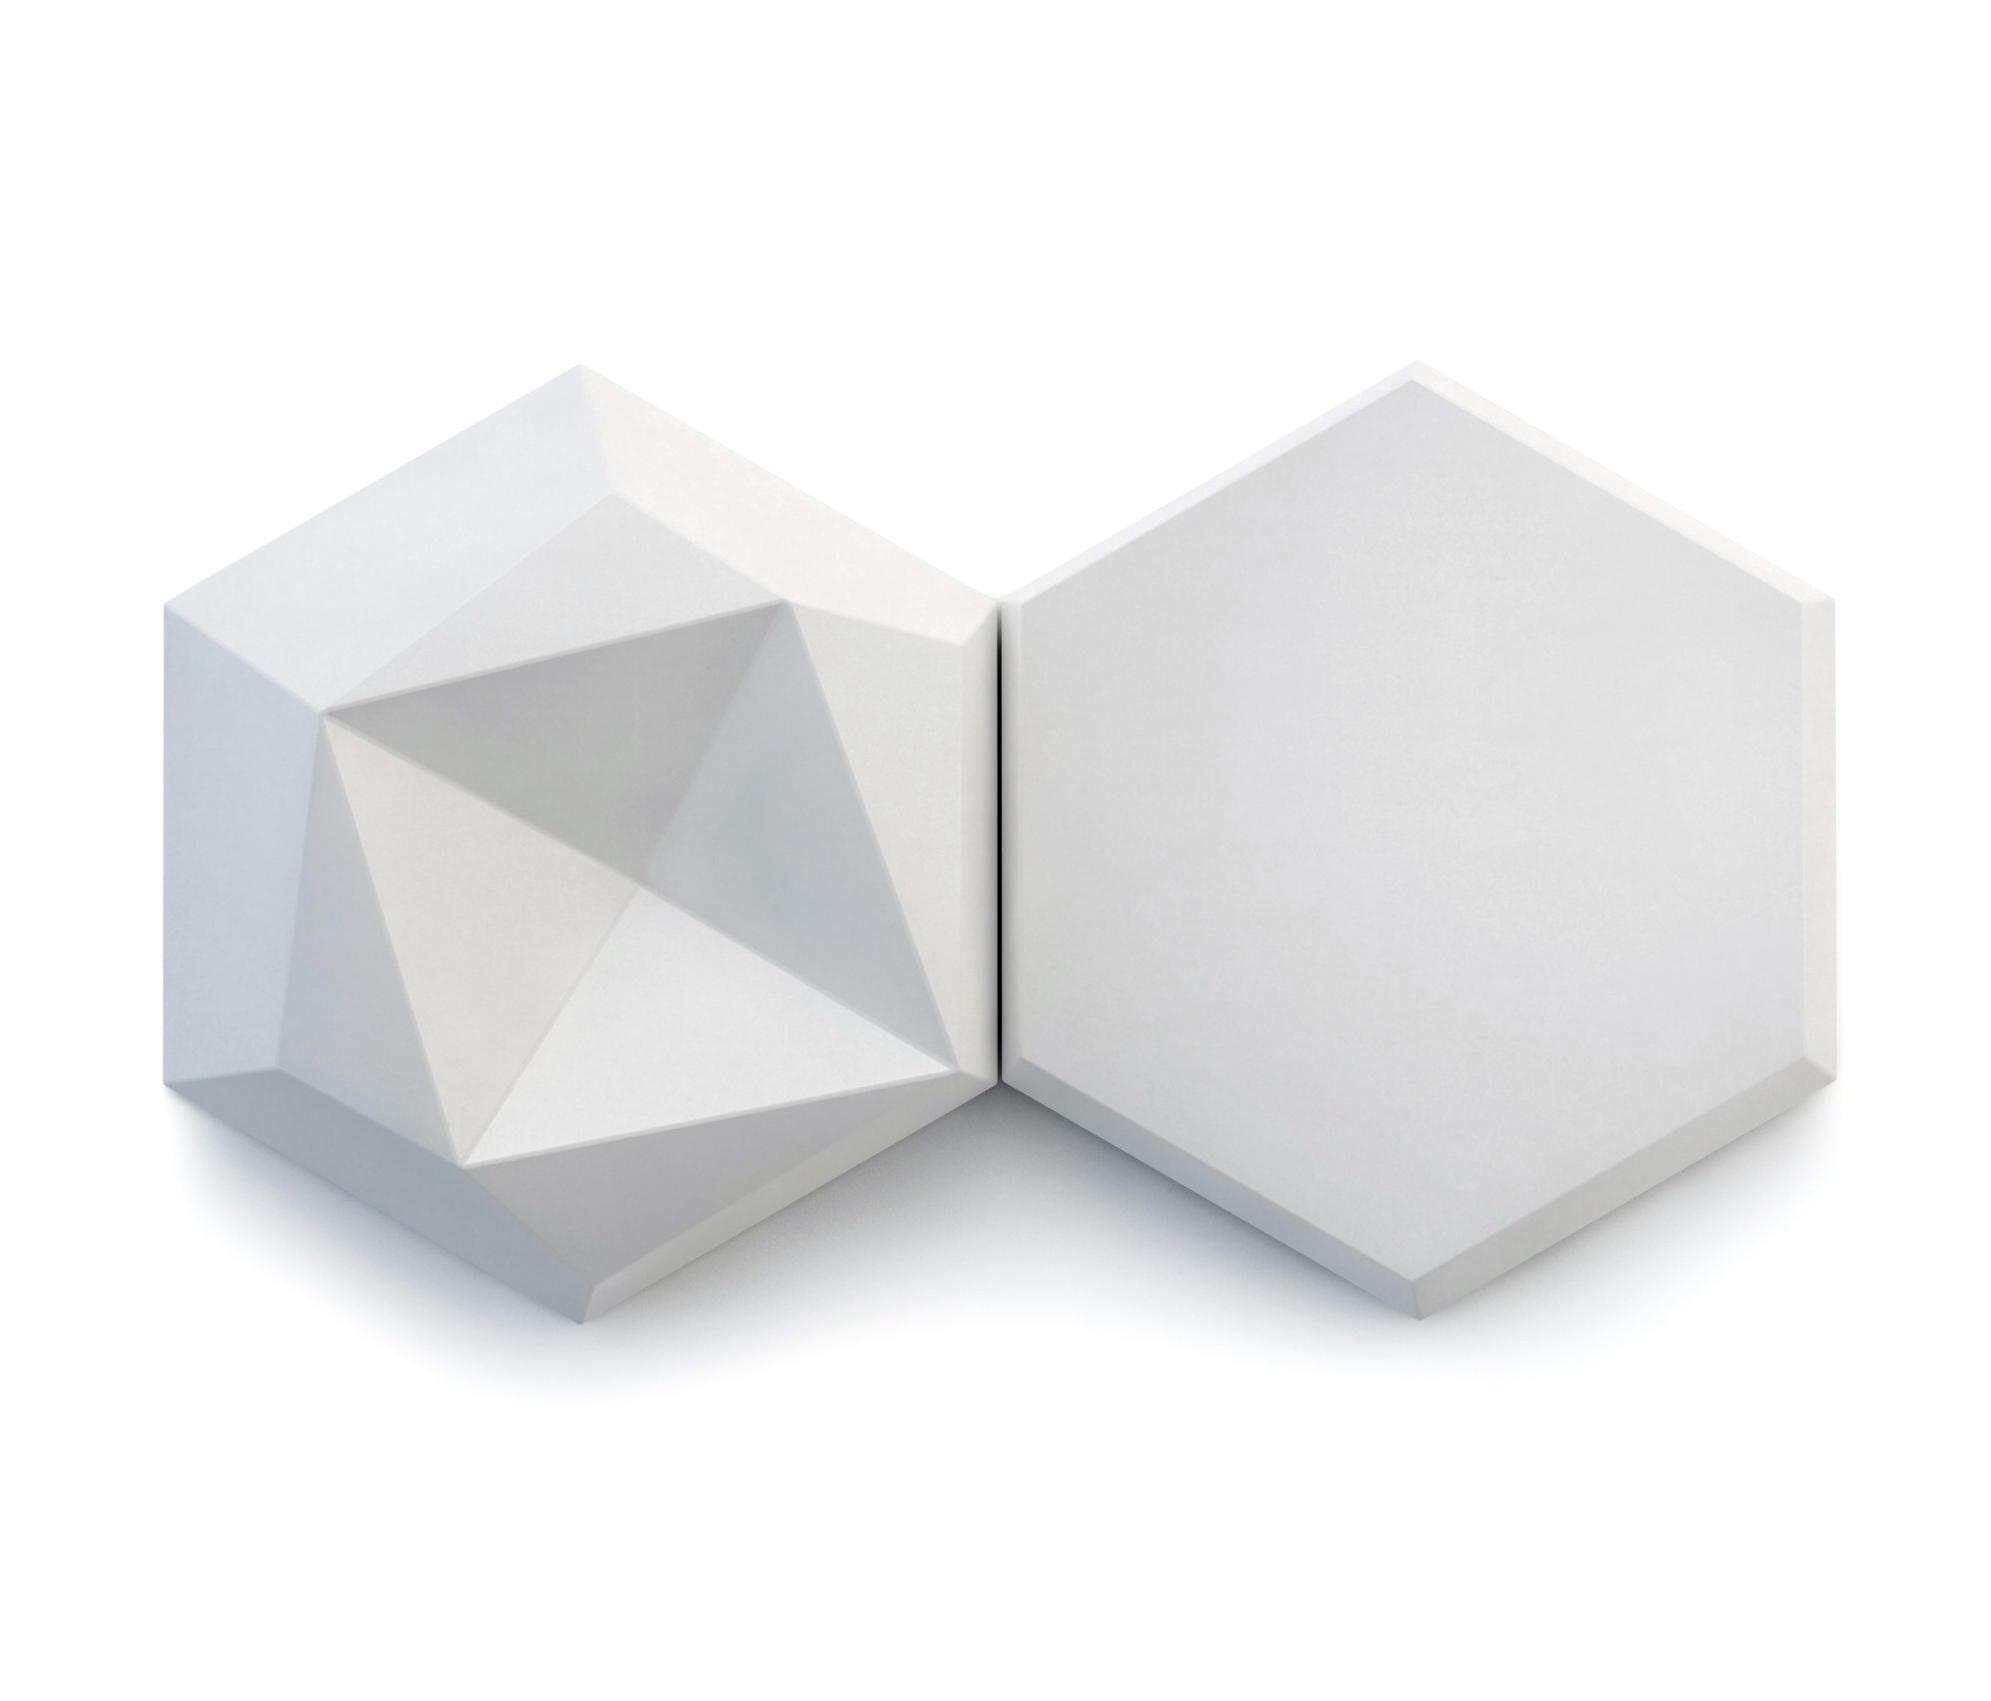 Edgy Concrete Tiles From Kaza Architonic